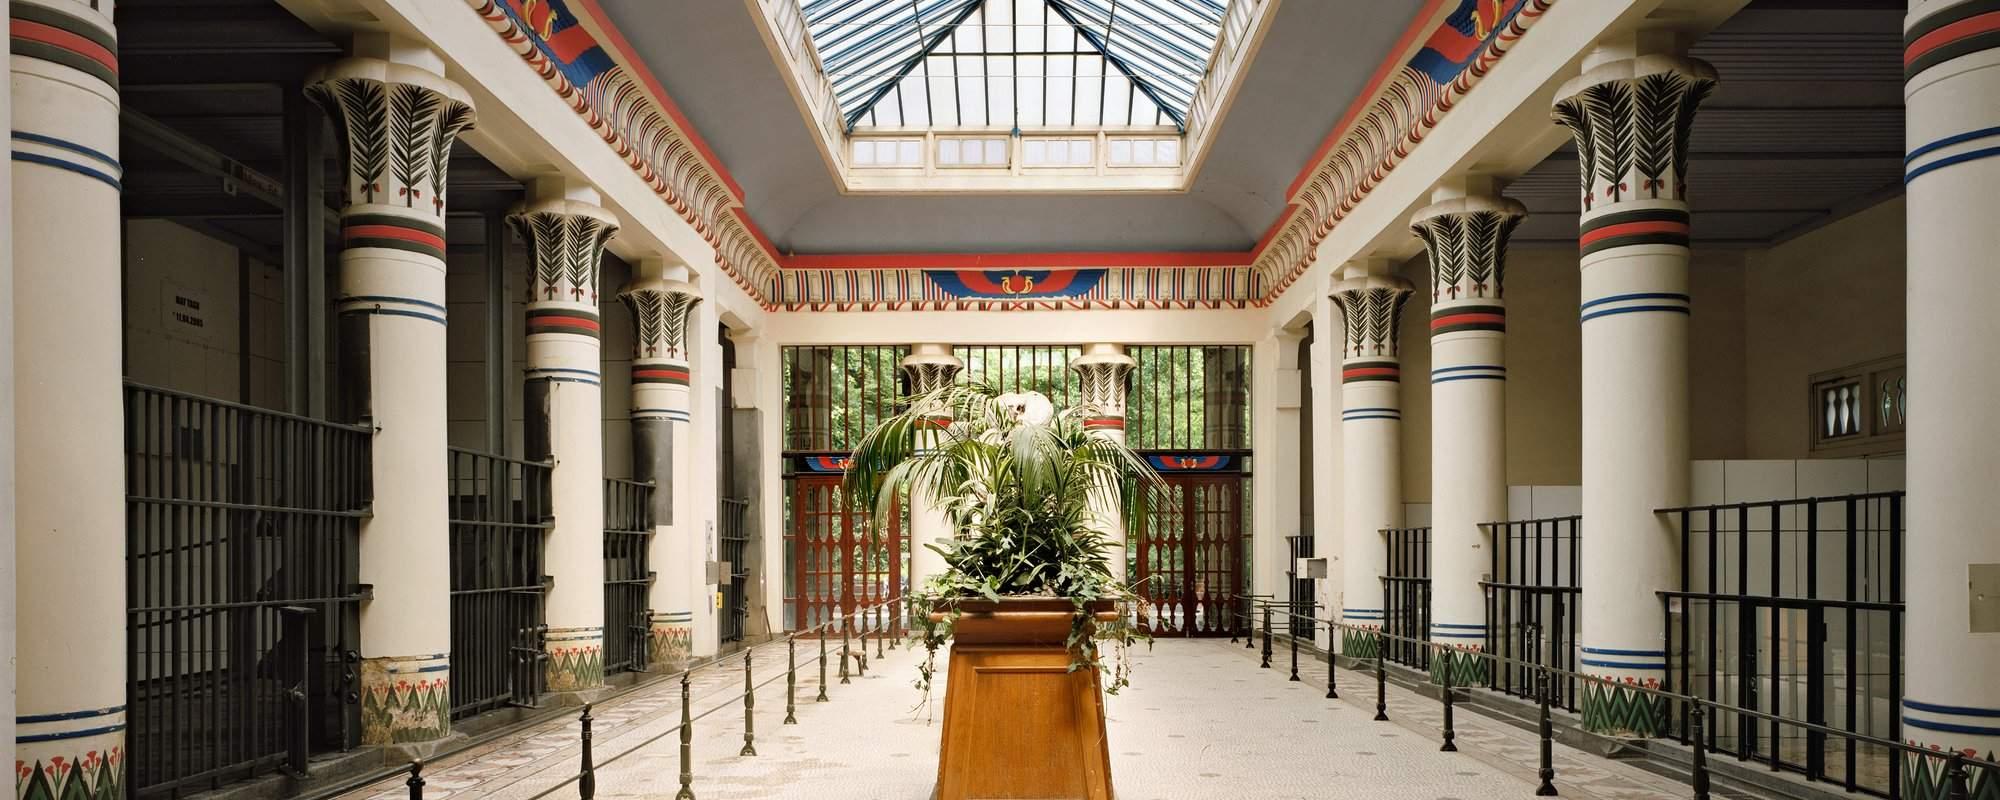 Olifantengebouw K Borghouts